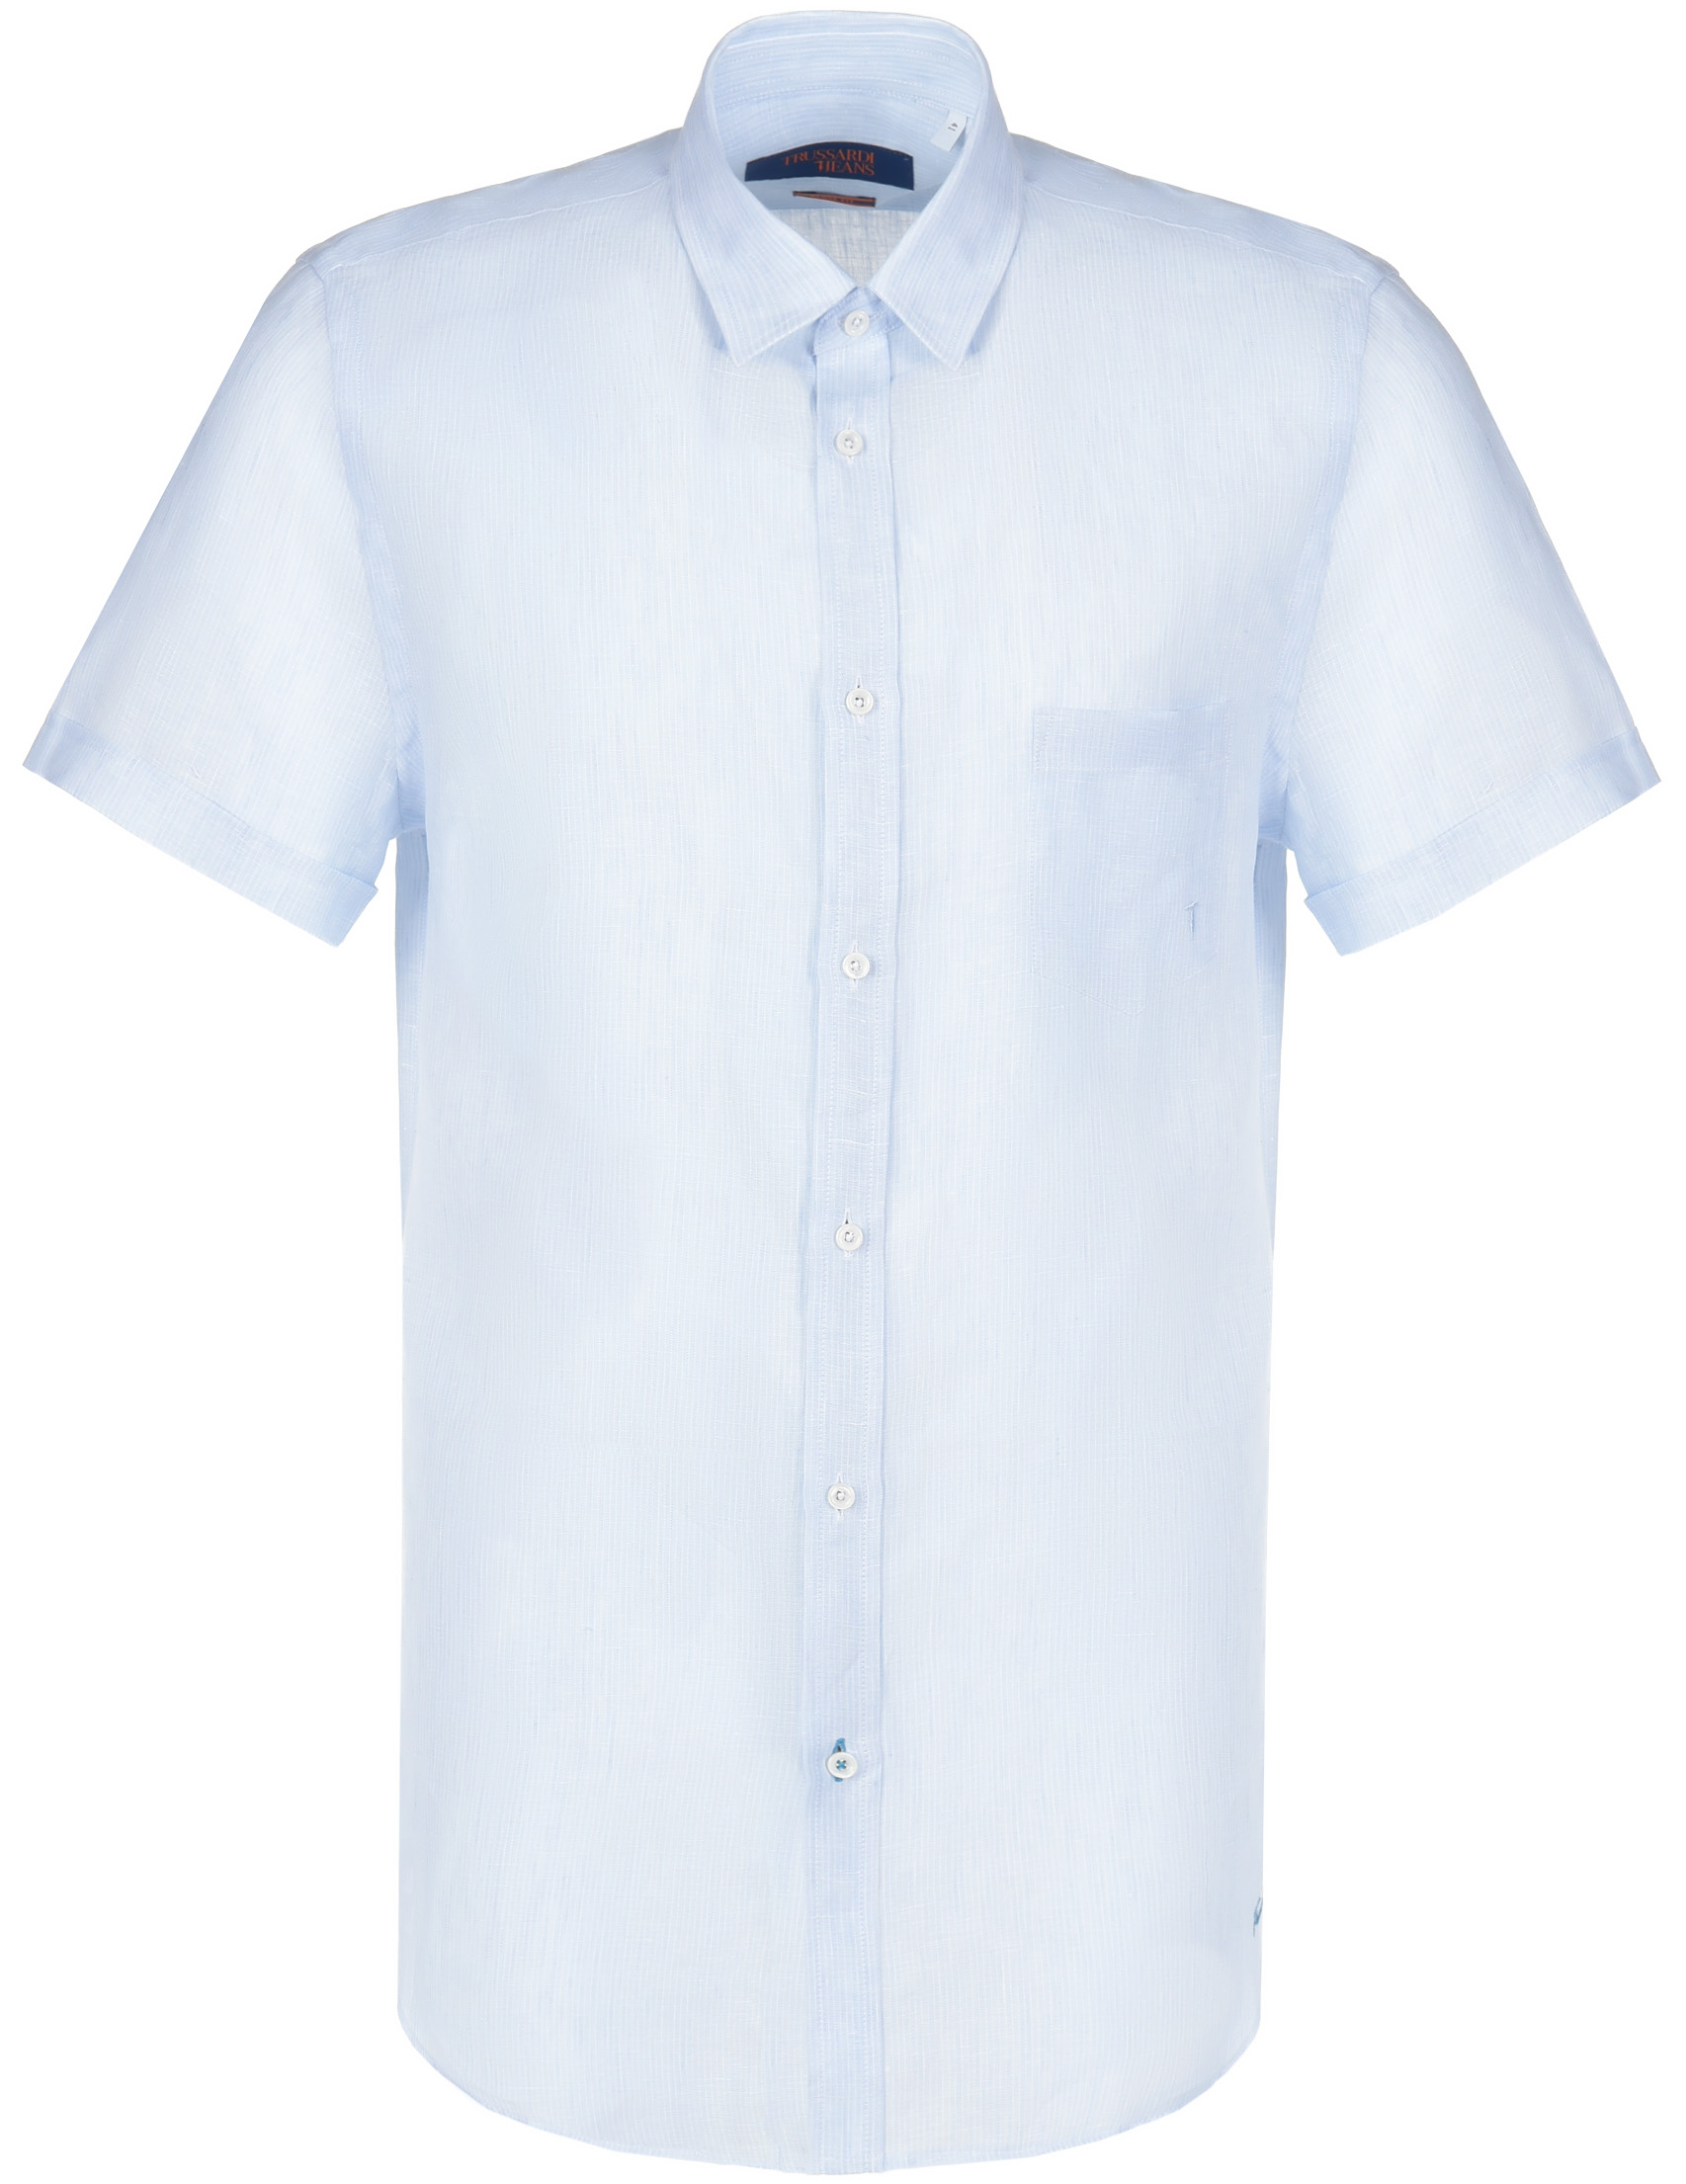 Купить Рубашки, Рубашка, TRUSSARDI JEANS, Голубой, 100%Лён, Весна-Лето